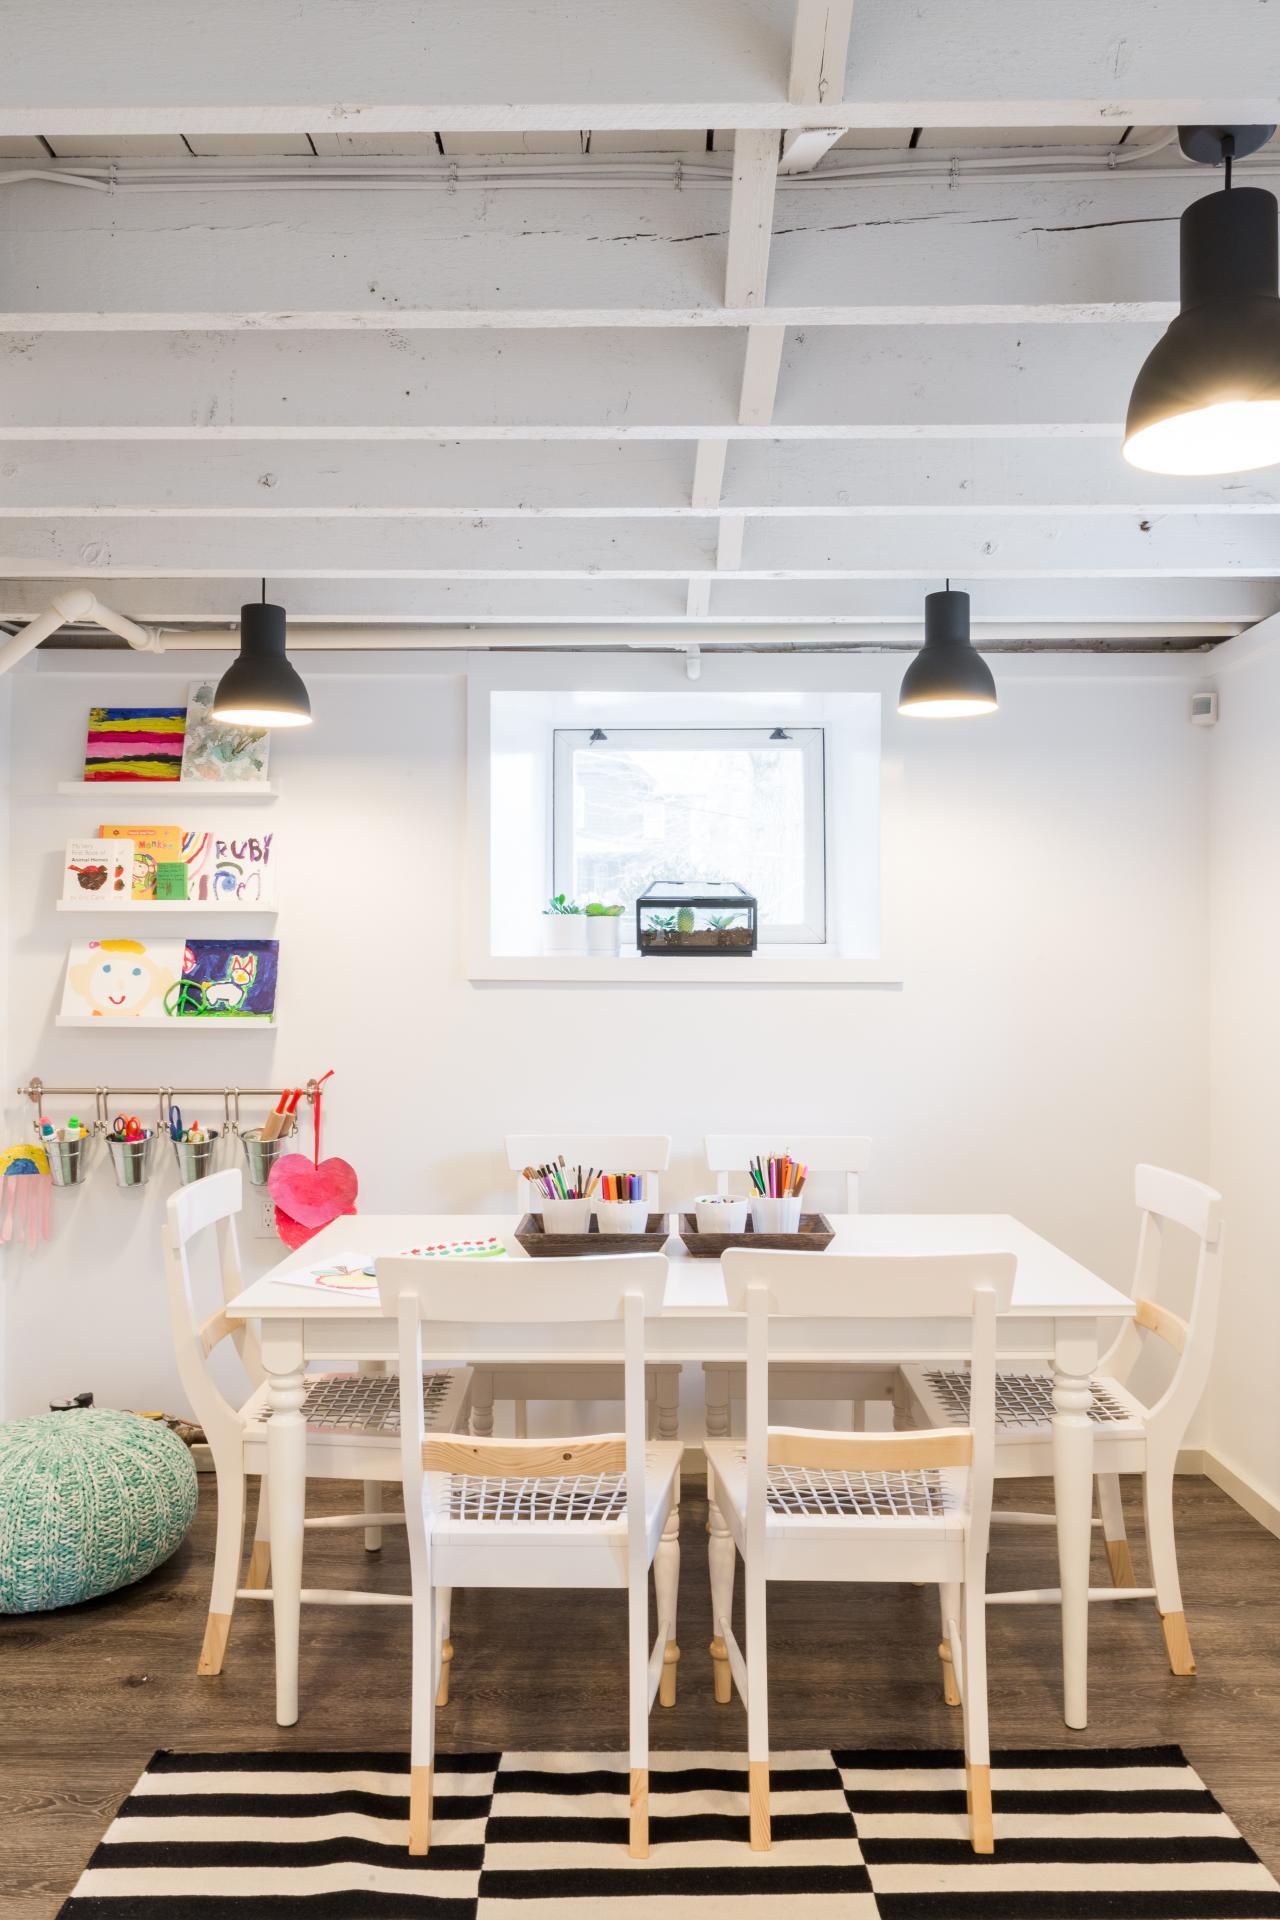 Ultimate Art Studio how to create the ultimate kids' art studio | hgtv's decorating